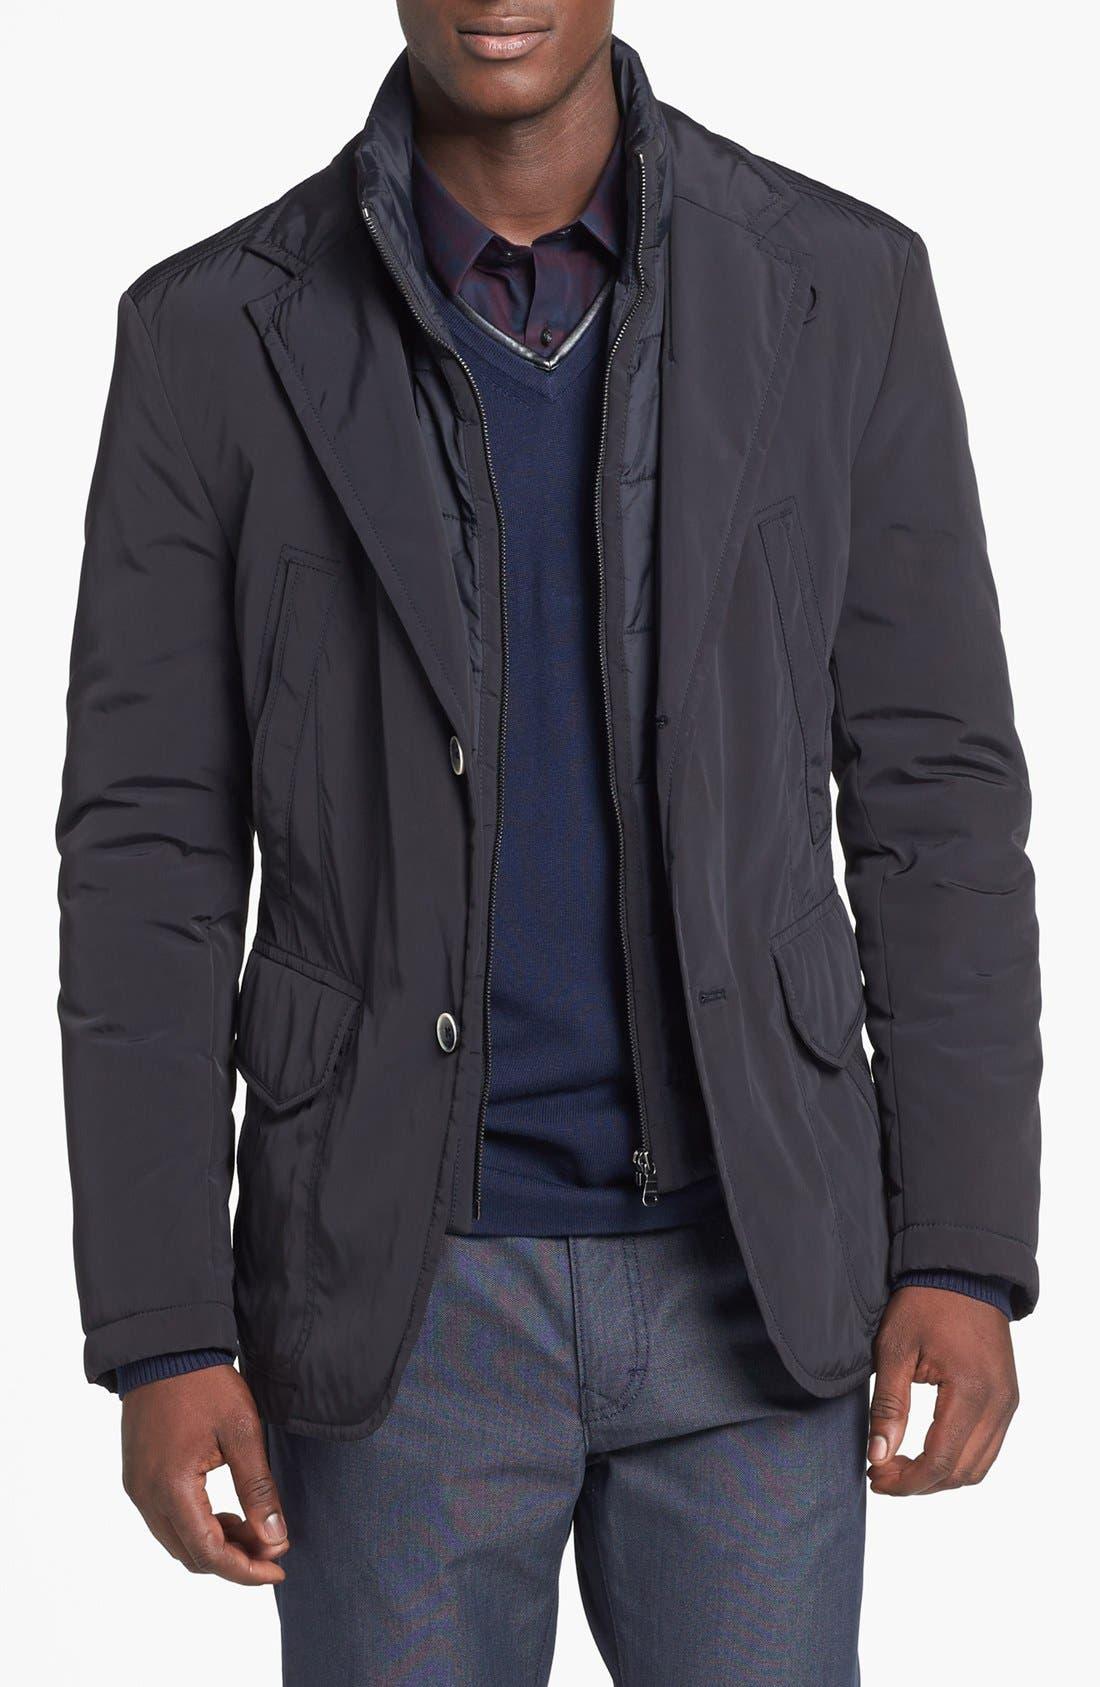 Alternate Image 1 Selected - BOSS HUGO BOSS 'Cartinus' Jacket